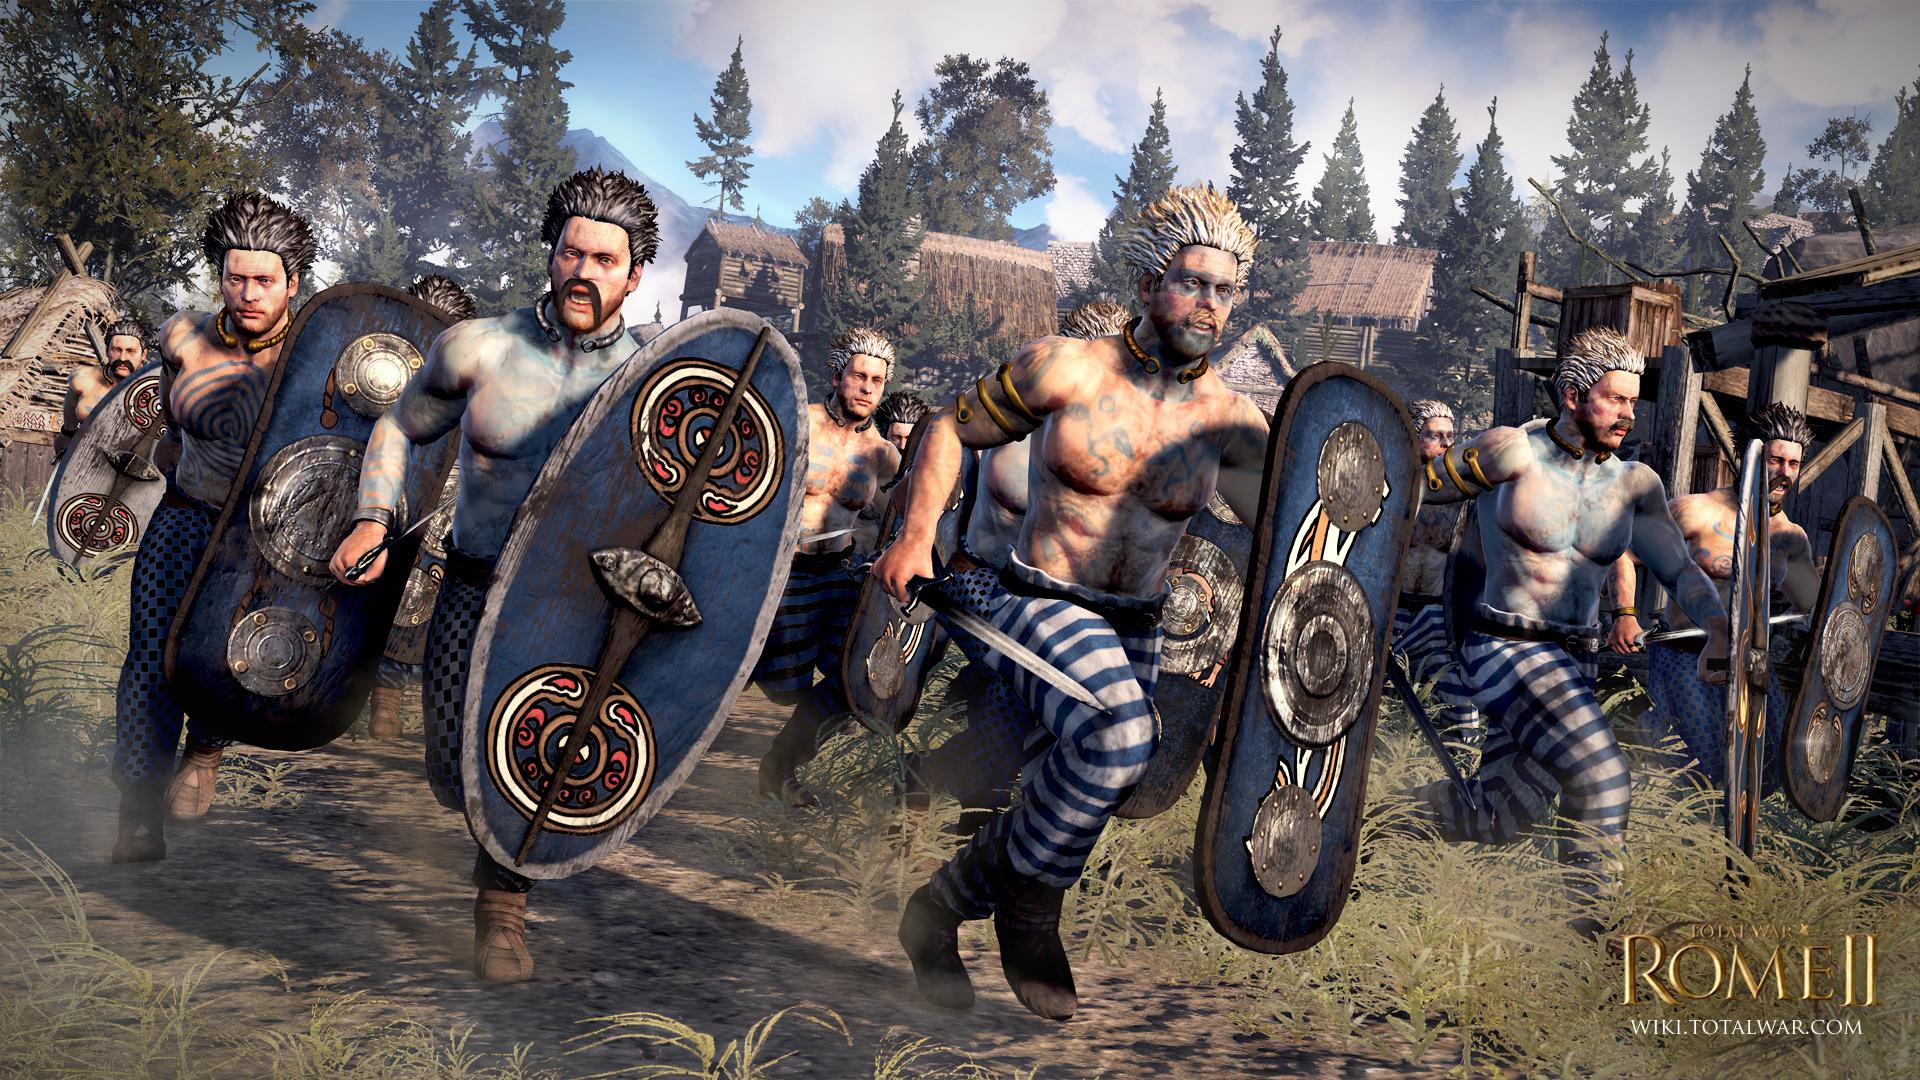 Free Download War Rome 2 Total War Rome 2 Wallpaper 1 Total War